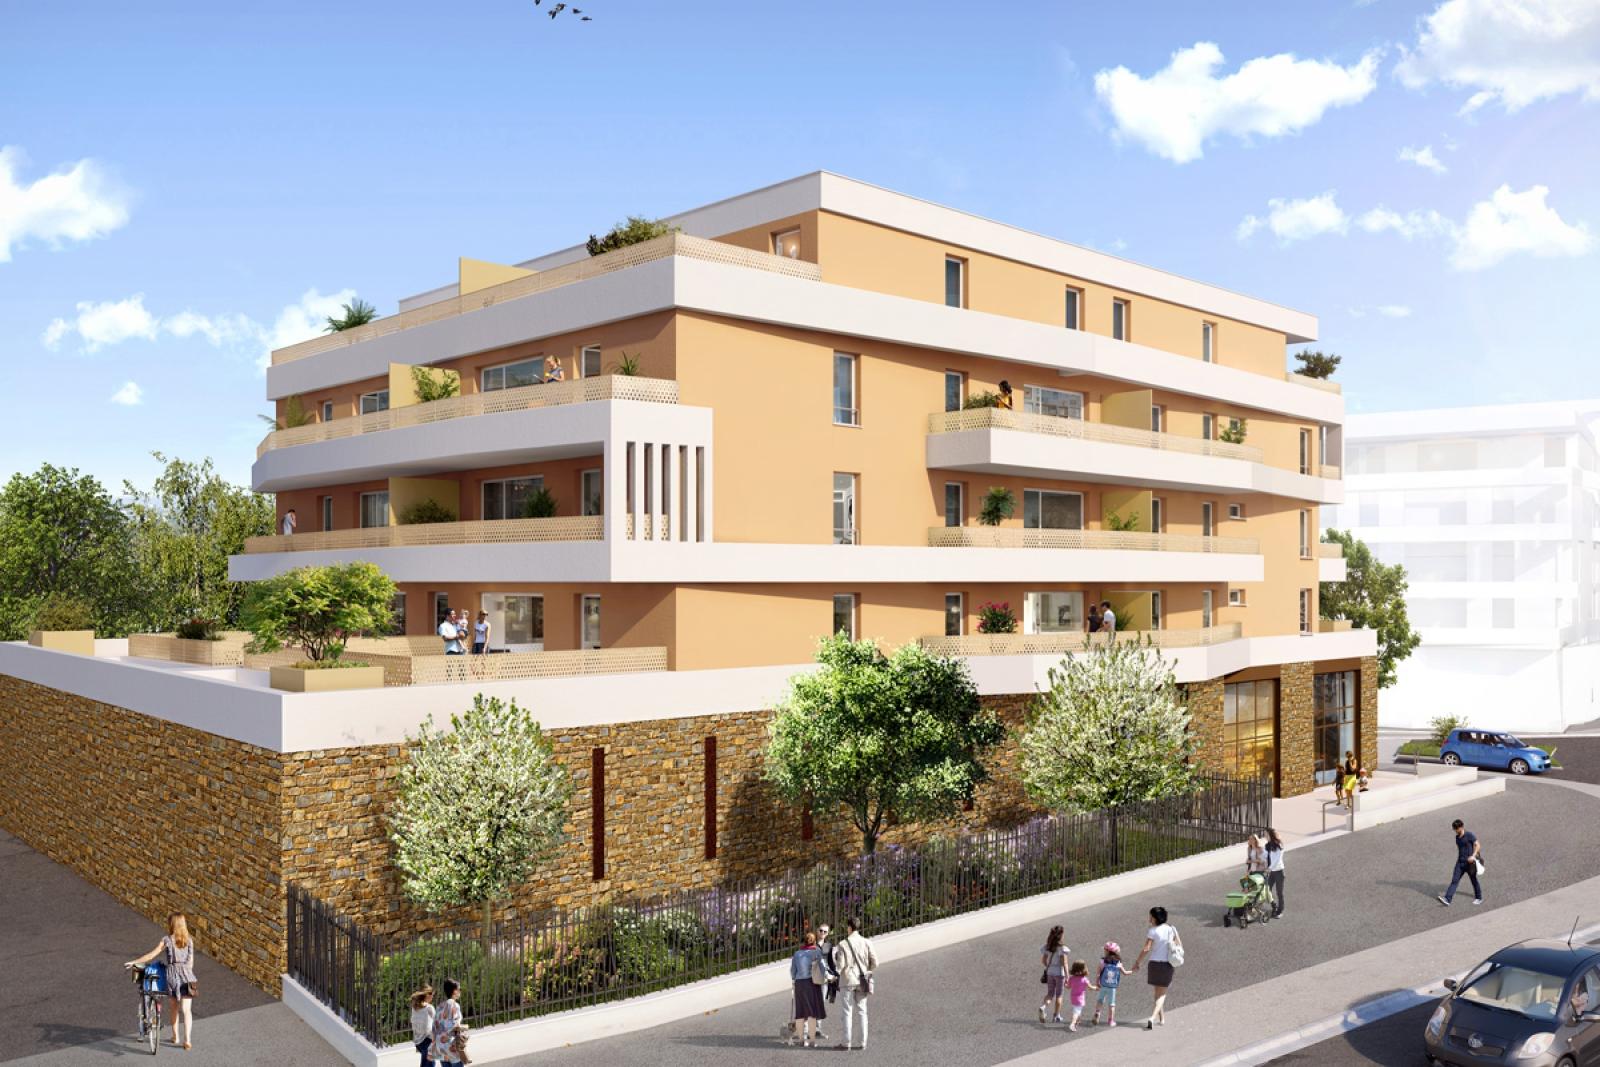 Achat appartement neuf dans la r sidence la strada for Achat appartement dans le neuf